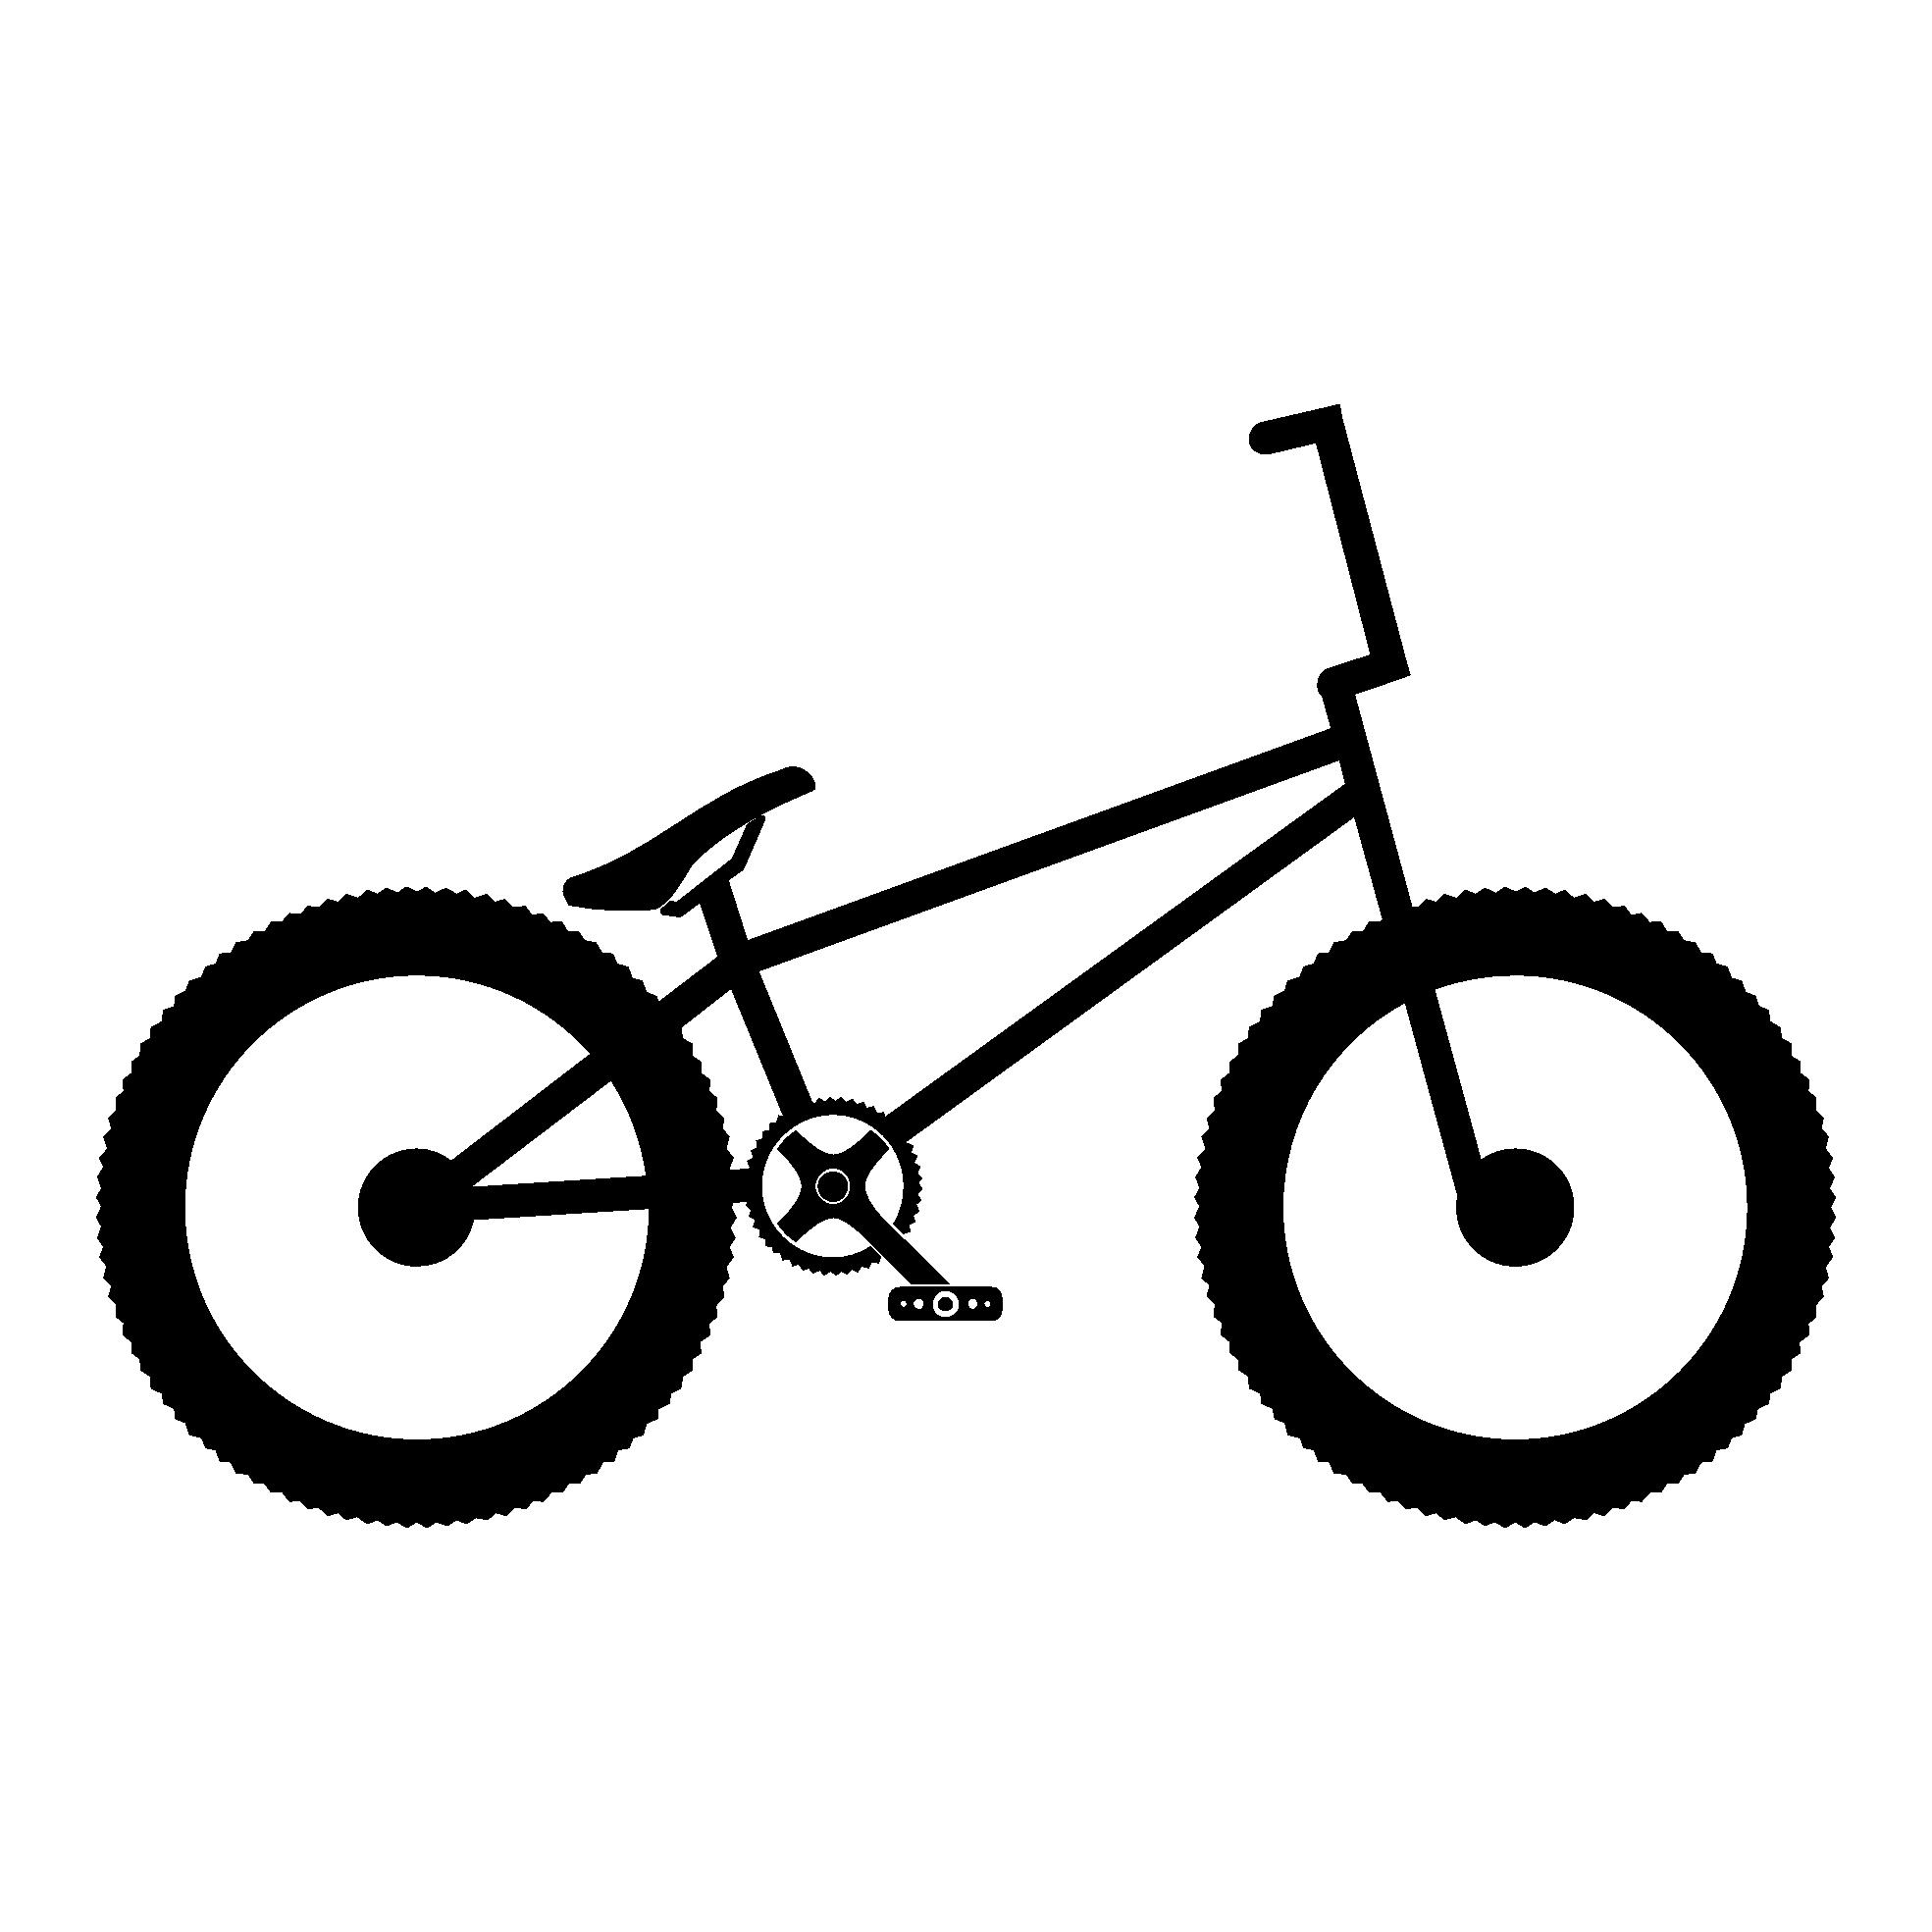 1969x1969 Duck Silhouette Clipart